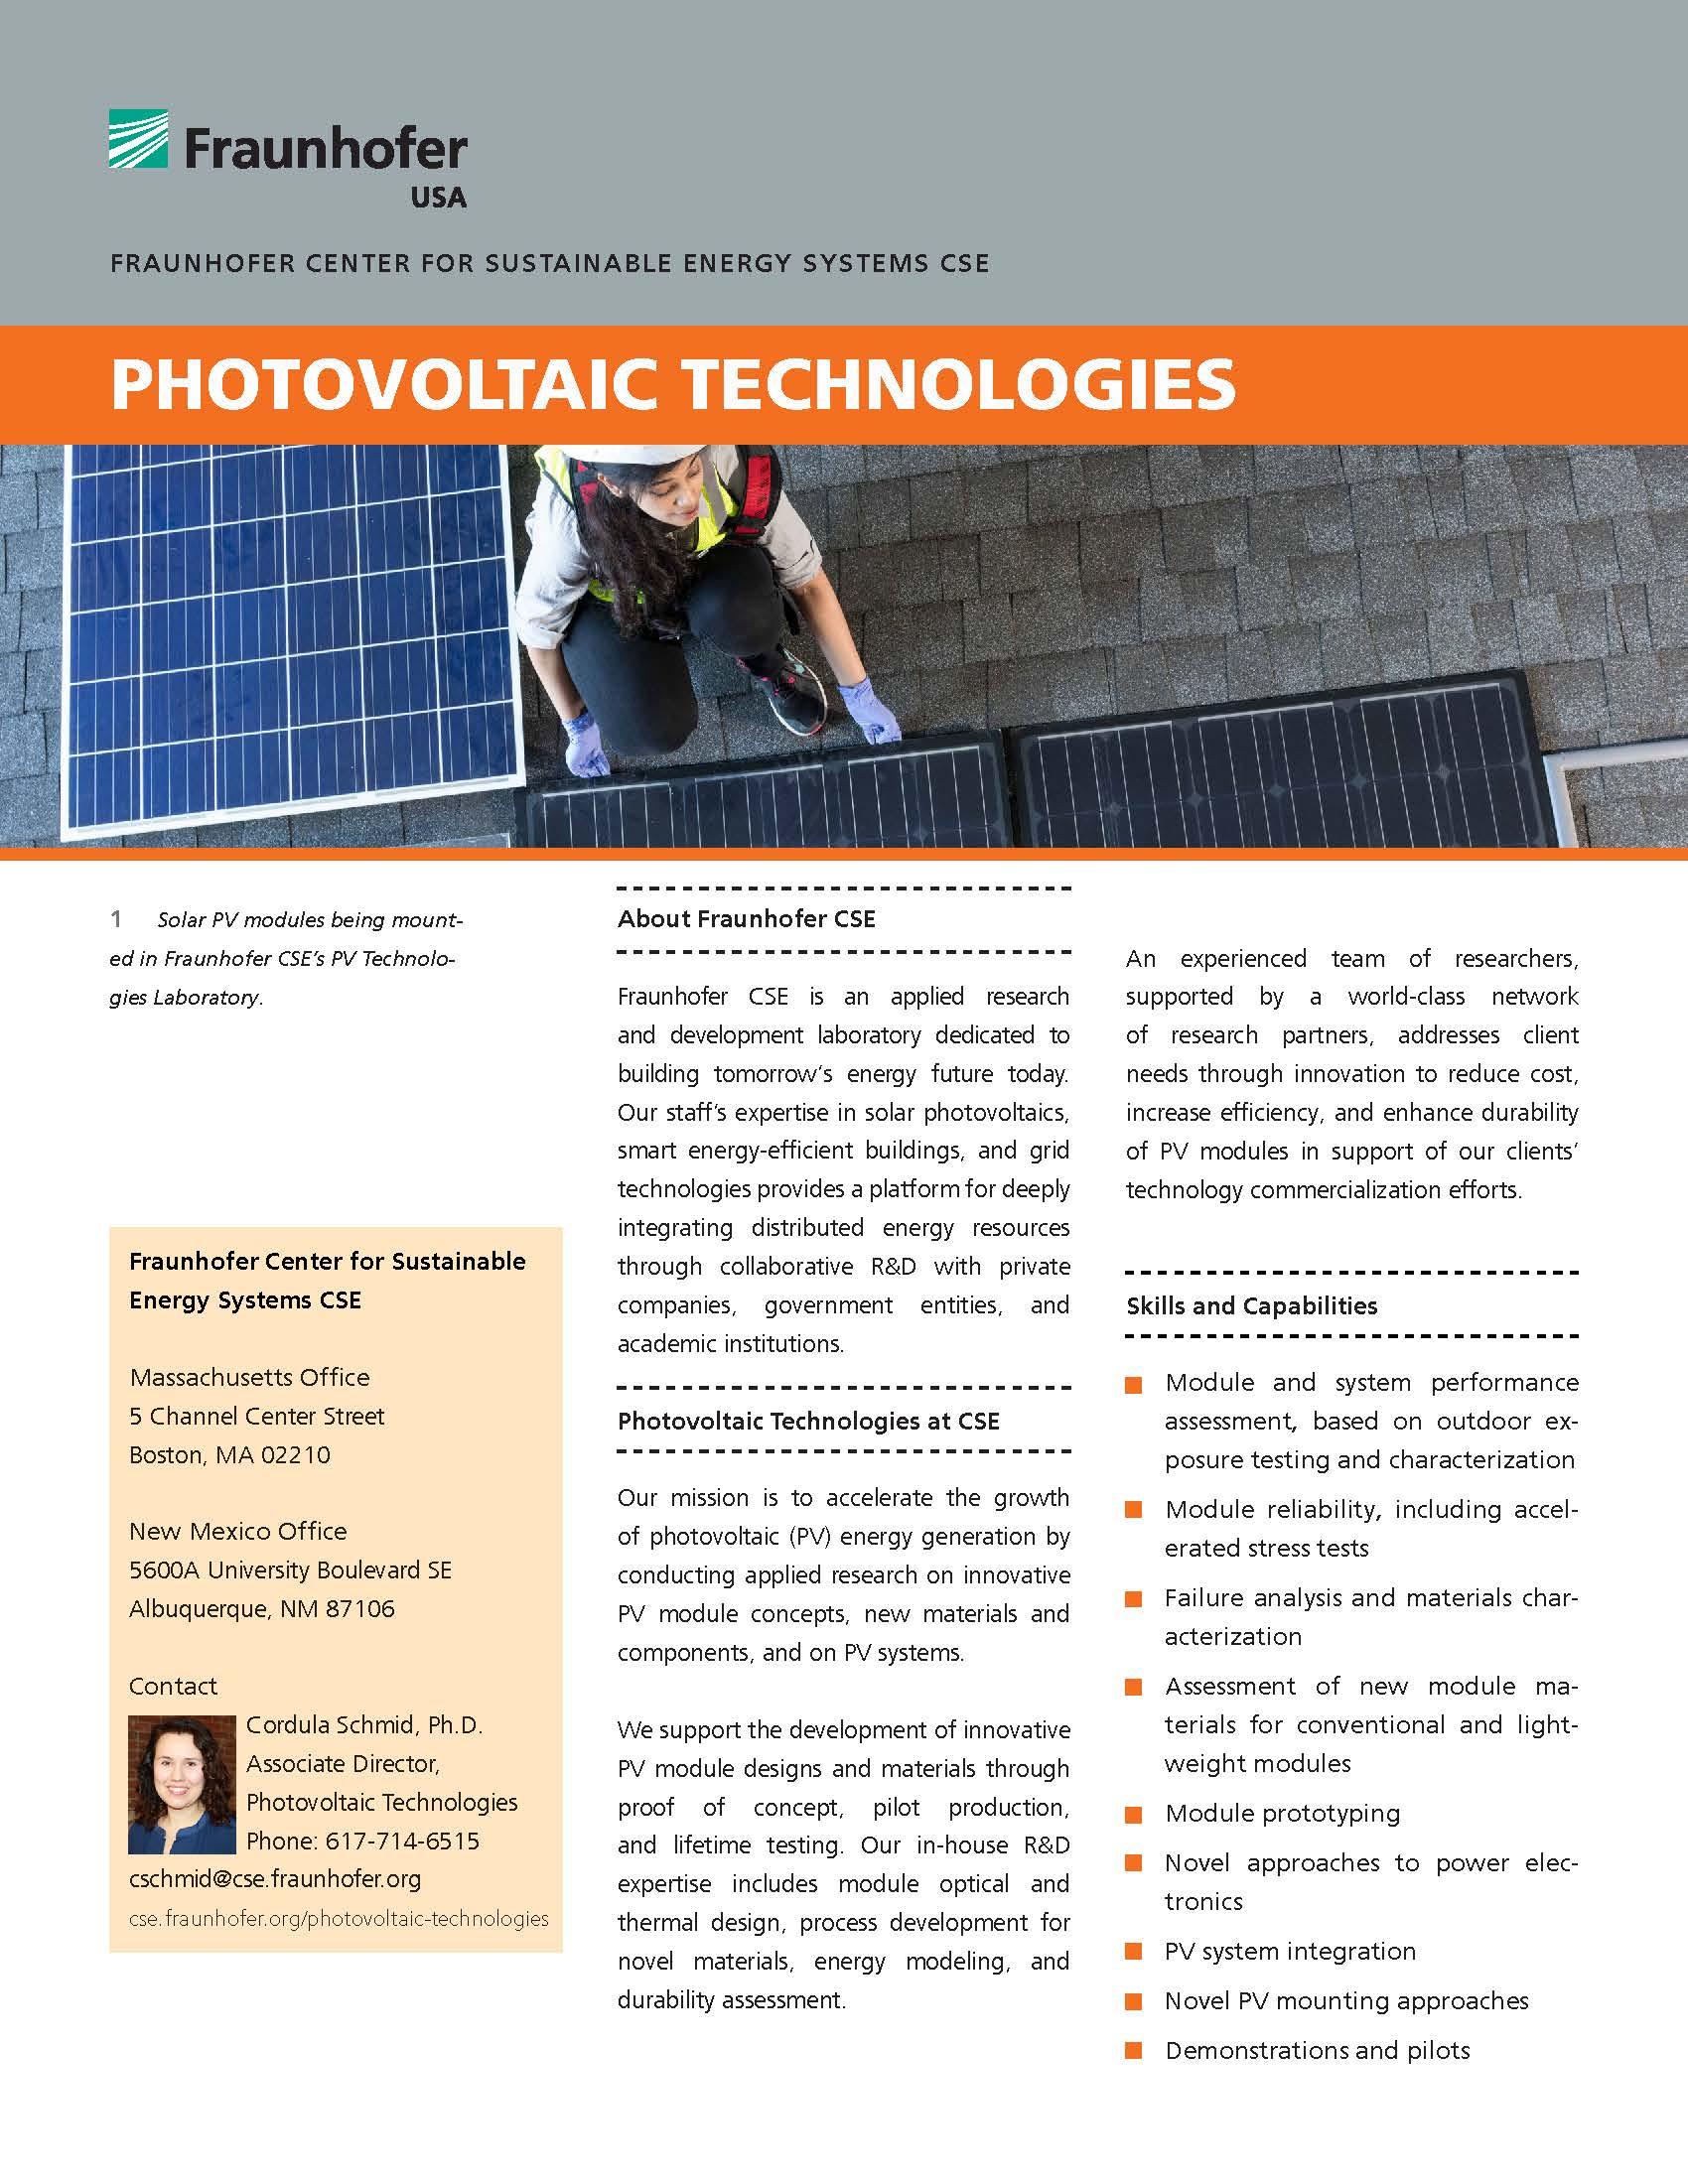 Photovoltaic Technologies